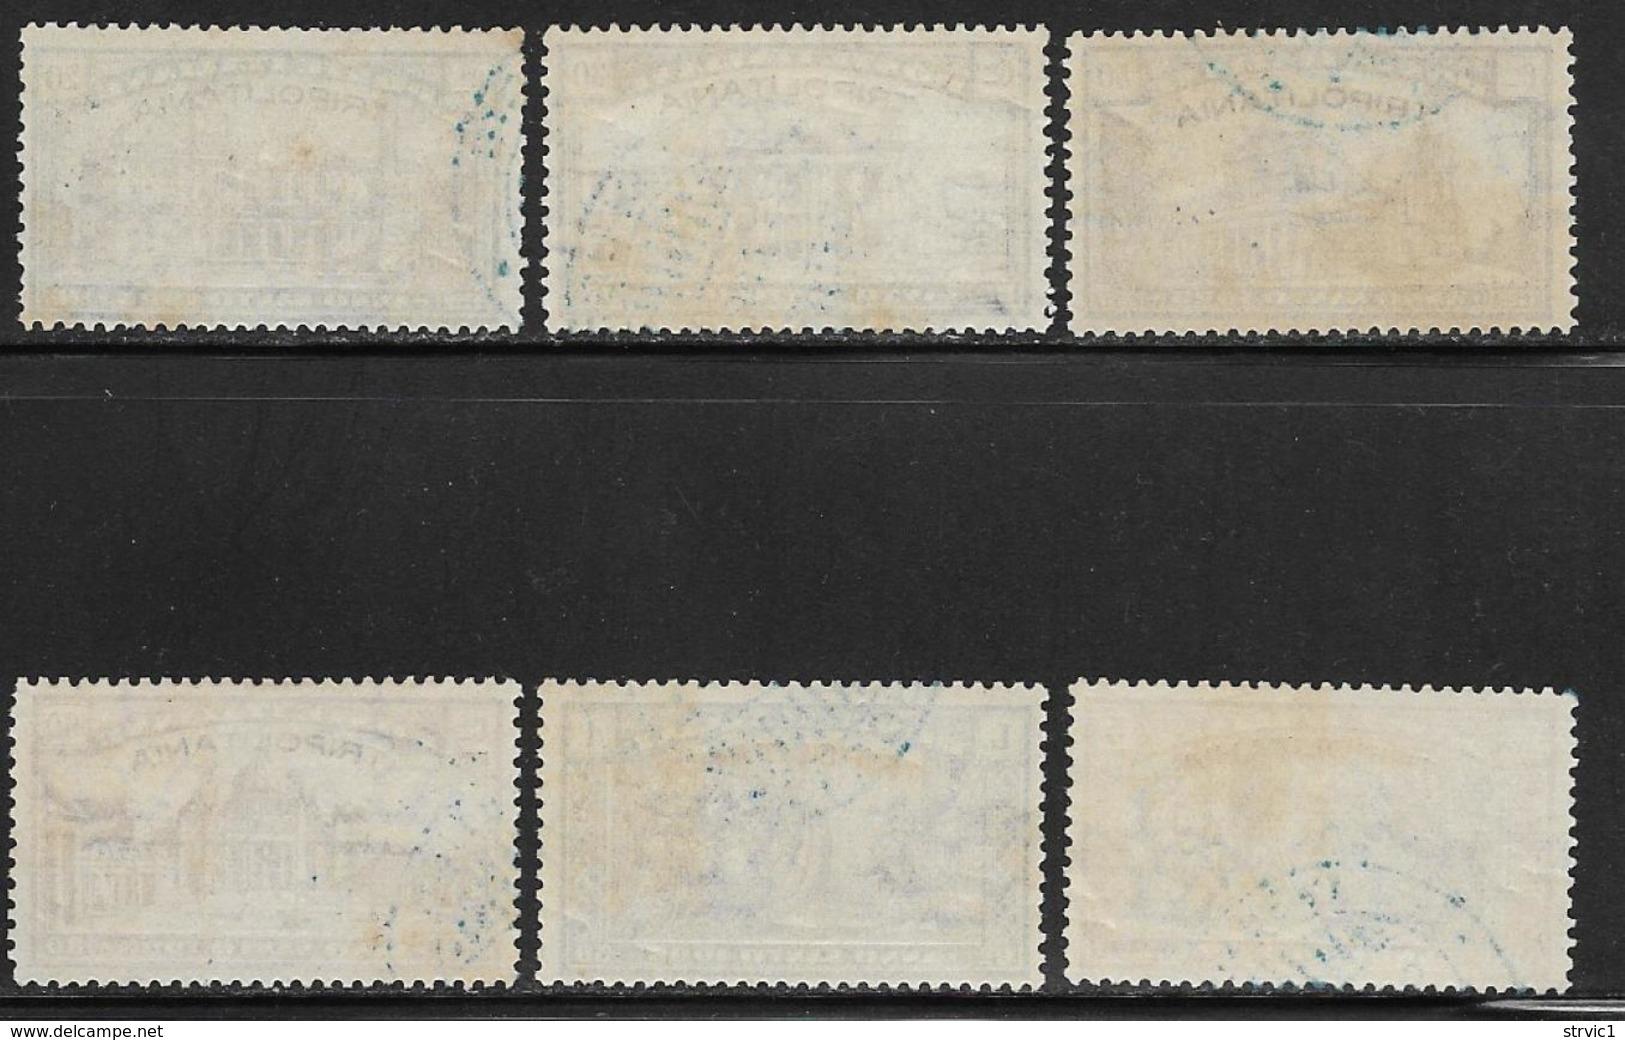 Tripolitania, Scott # B1-6 Used Italy Holy Year Issue Overprinted, 1925, CV$194.00 - Tripolitania